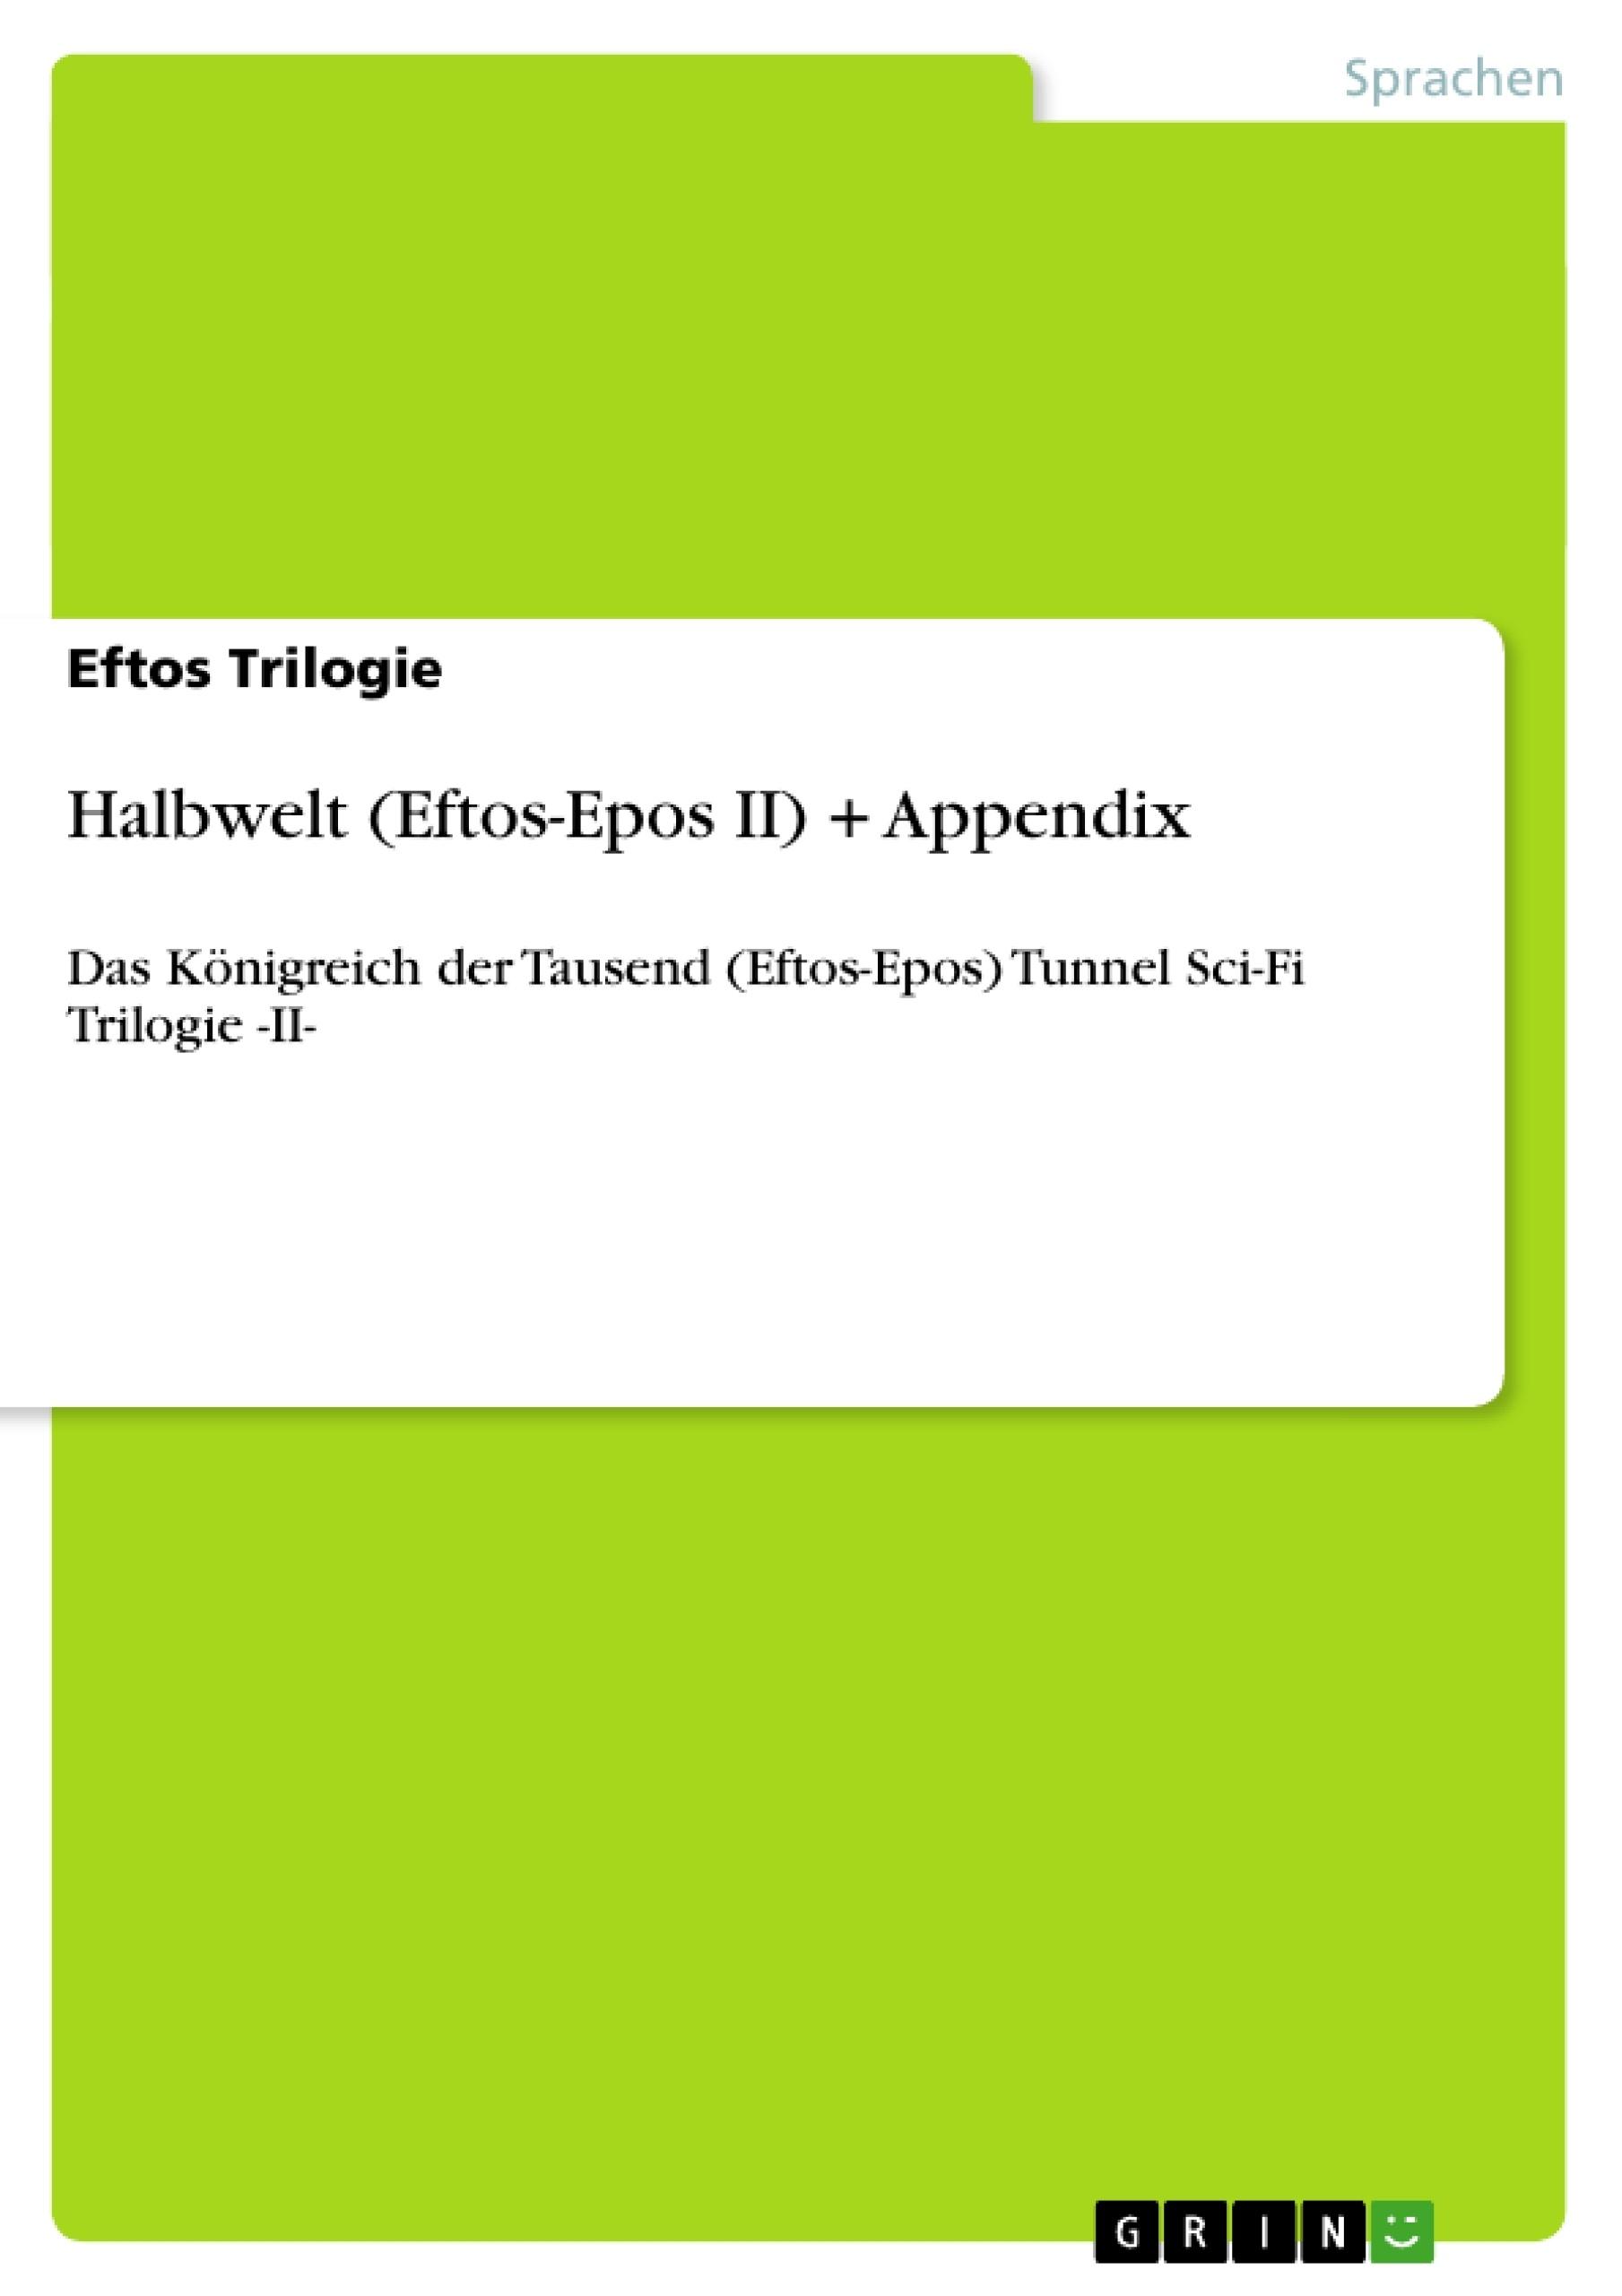 Titel: Halbwelt (Eftos-Epos II) + Appendix